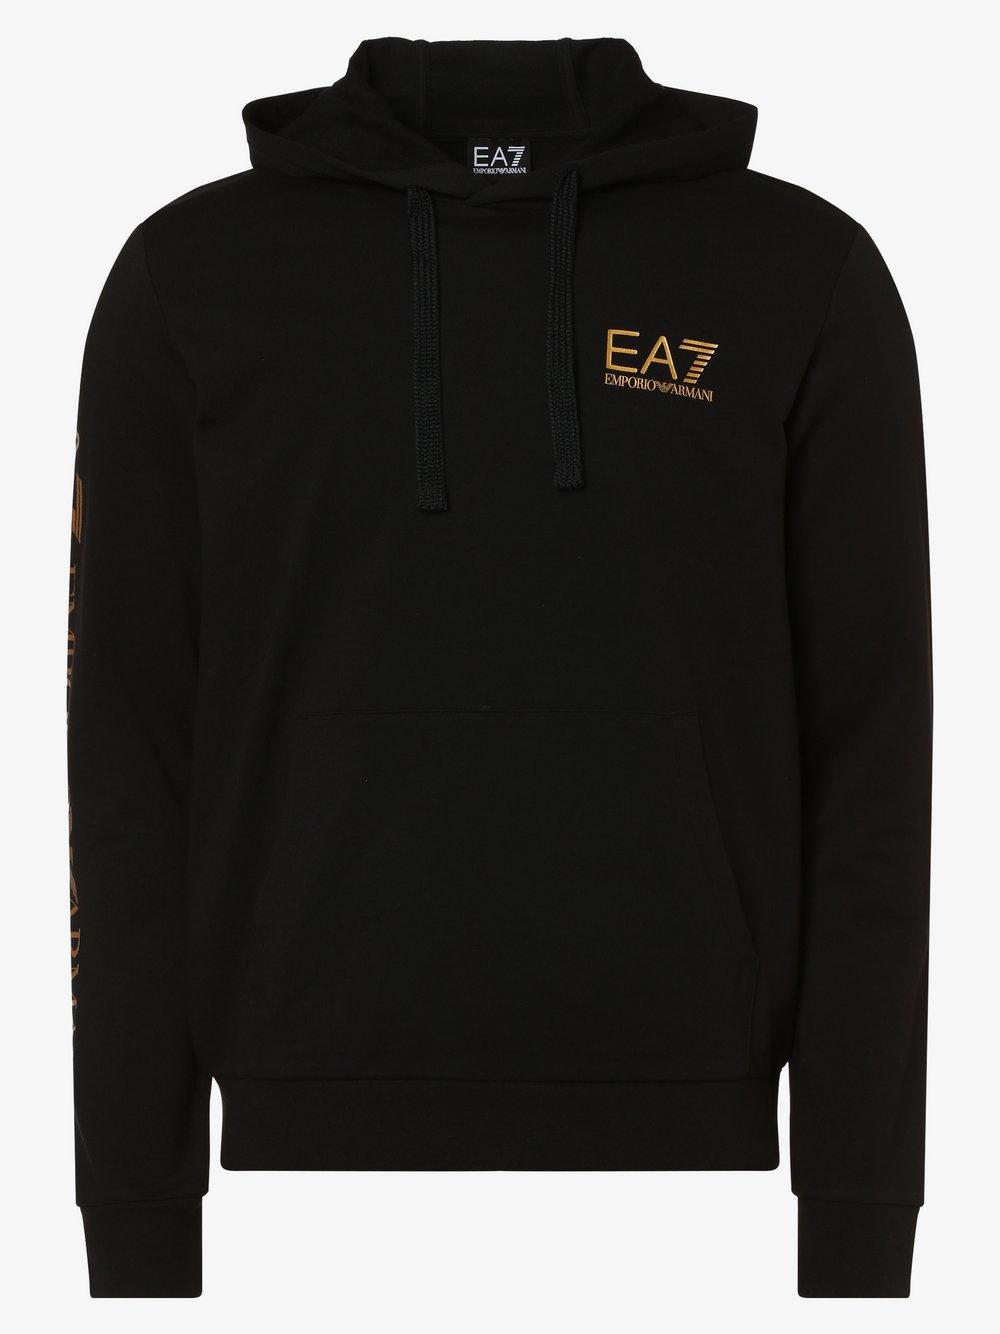 EA7 Emporio Armani - Męska bluza nierozpinana, czarny